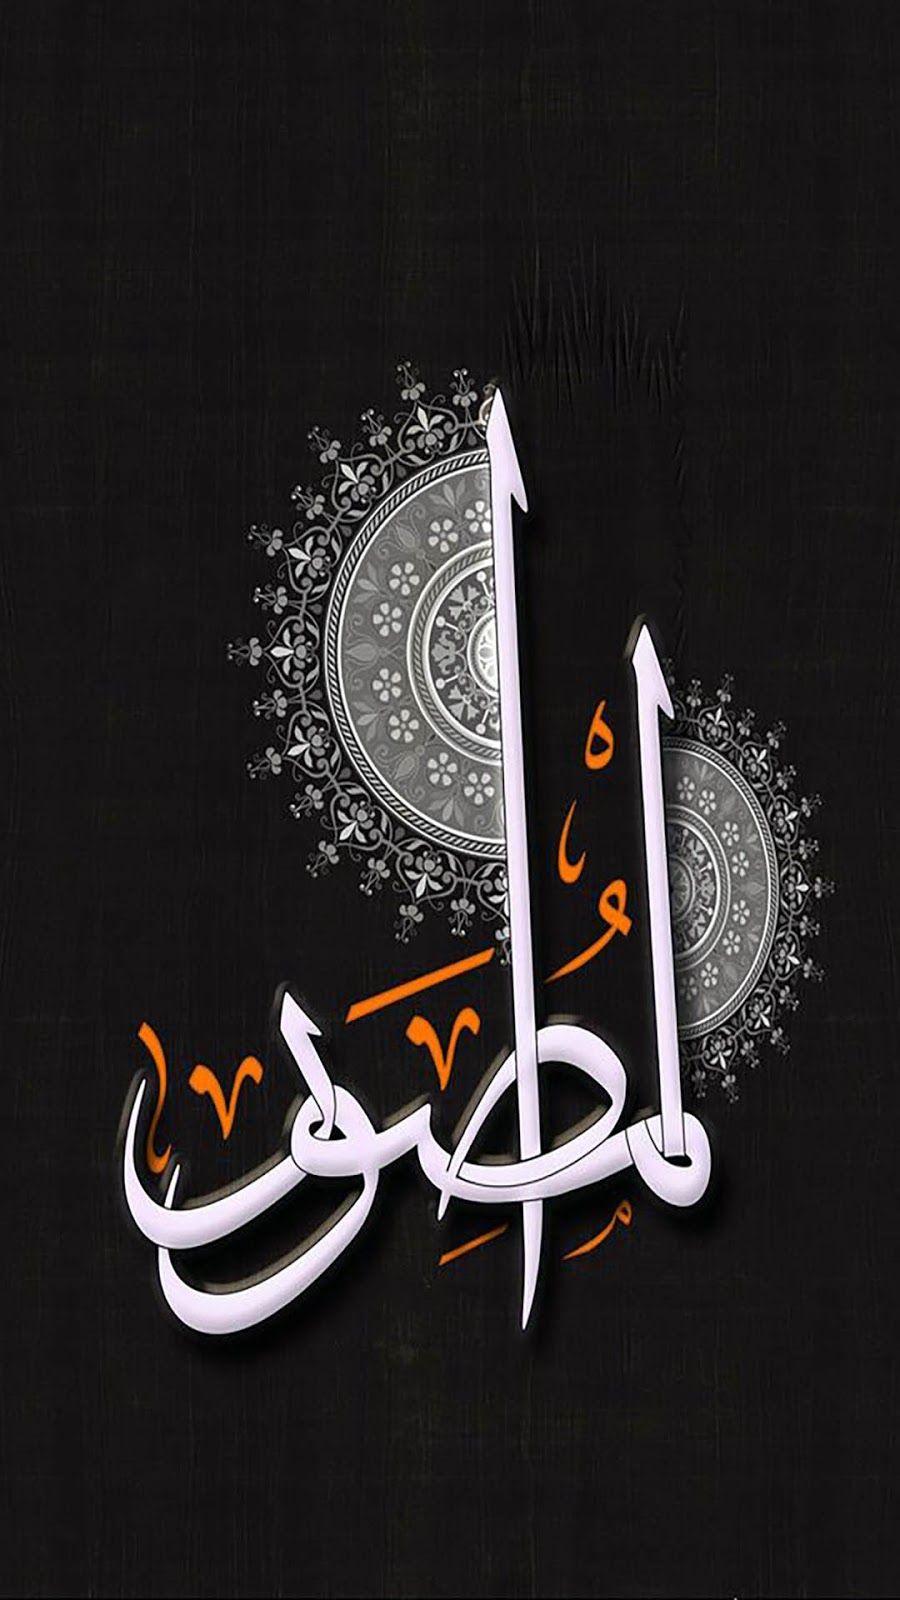 Kaligrafi Seni Kaligrafi Arab Seni Kaligrafi Seni Islamis